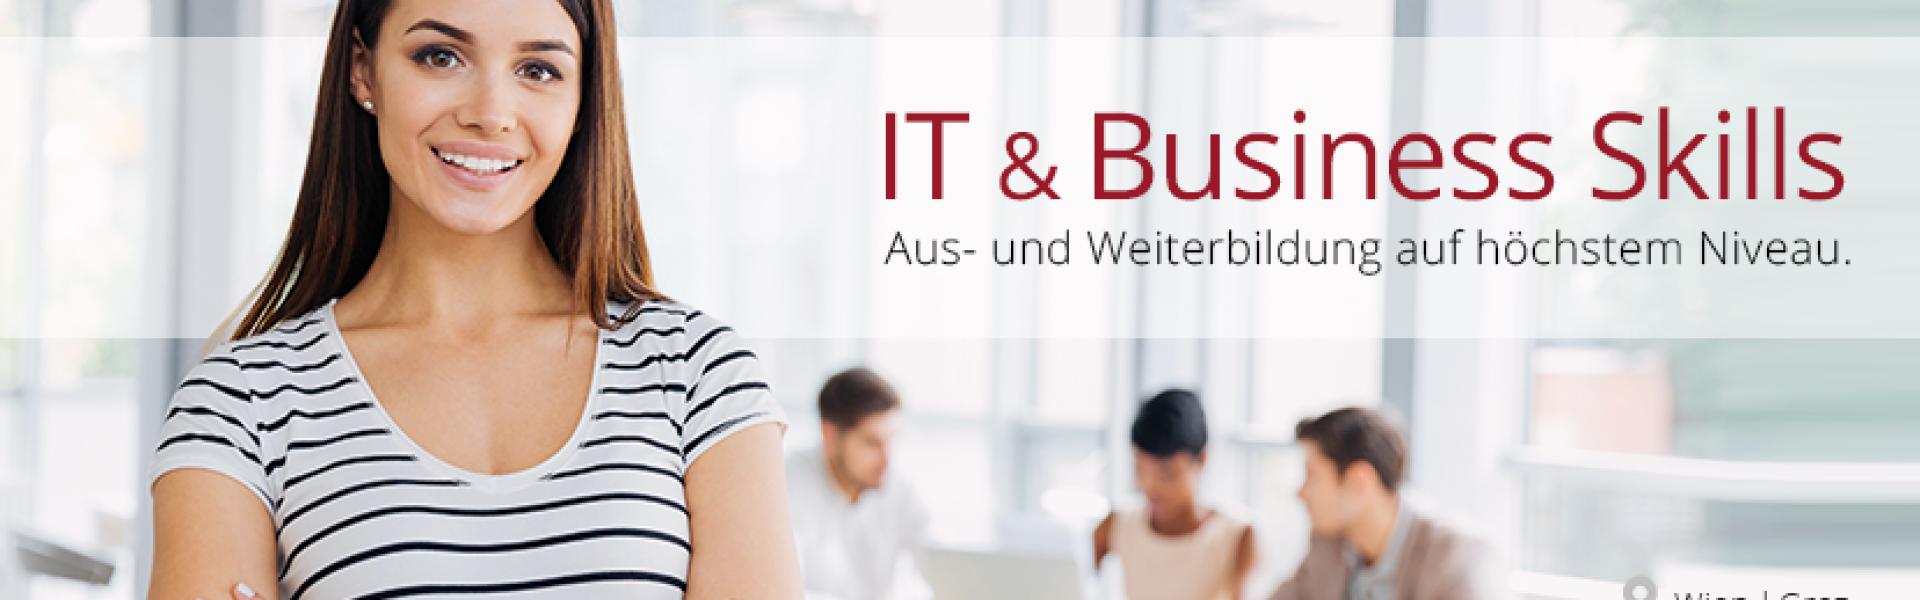 tecTrain GmbH cover